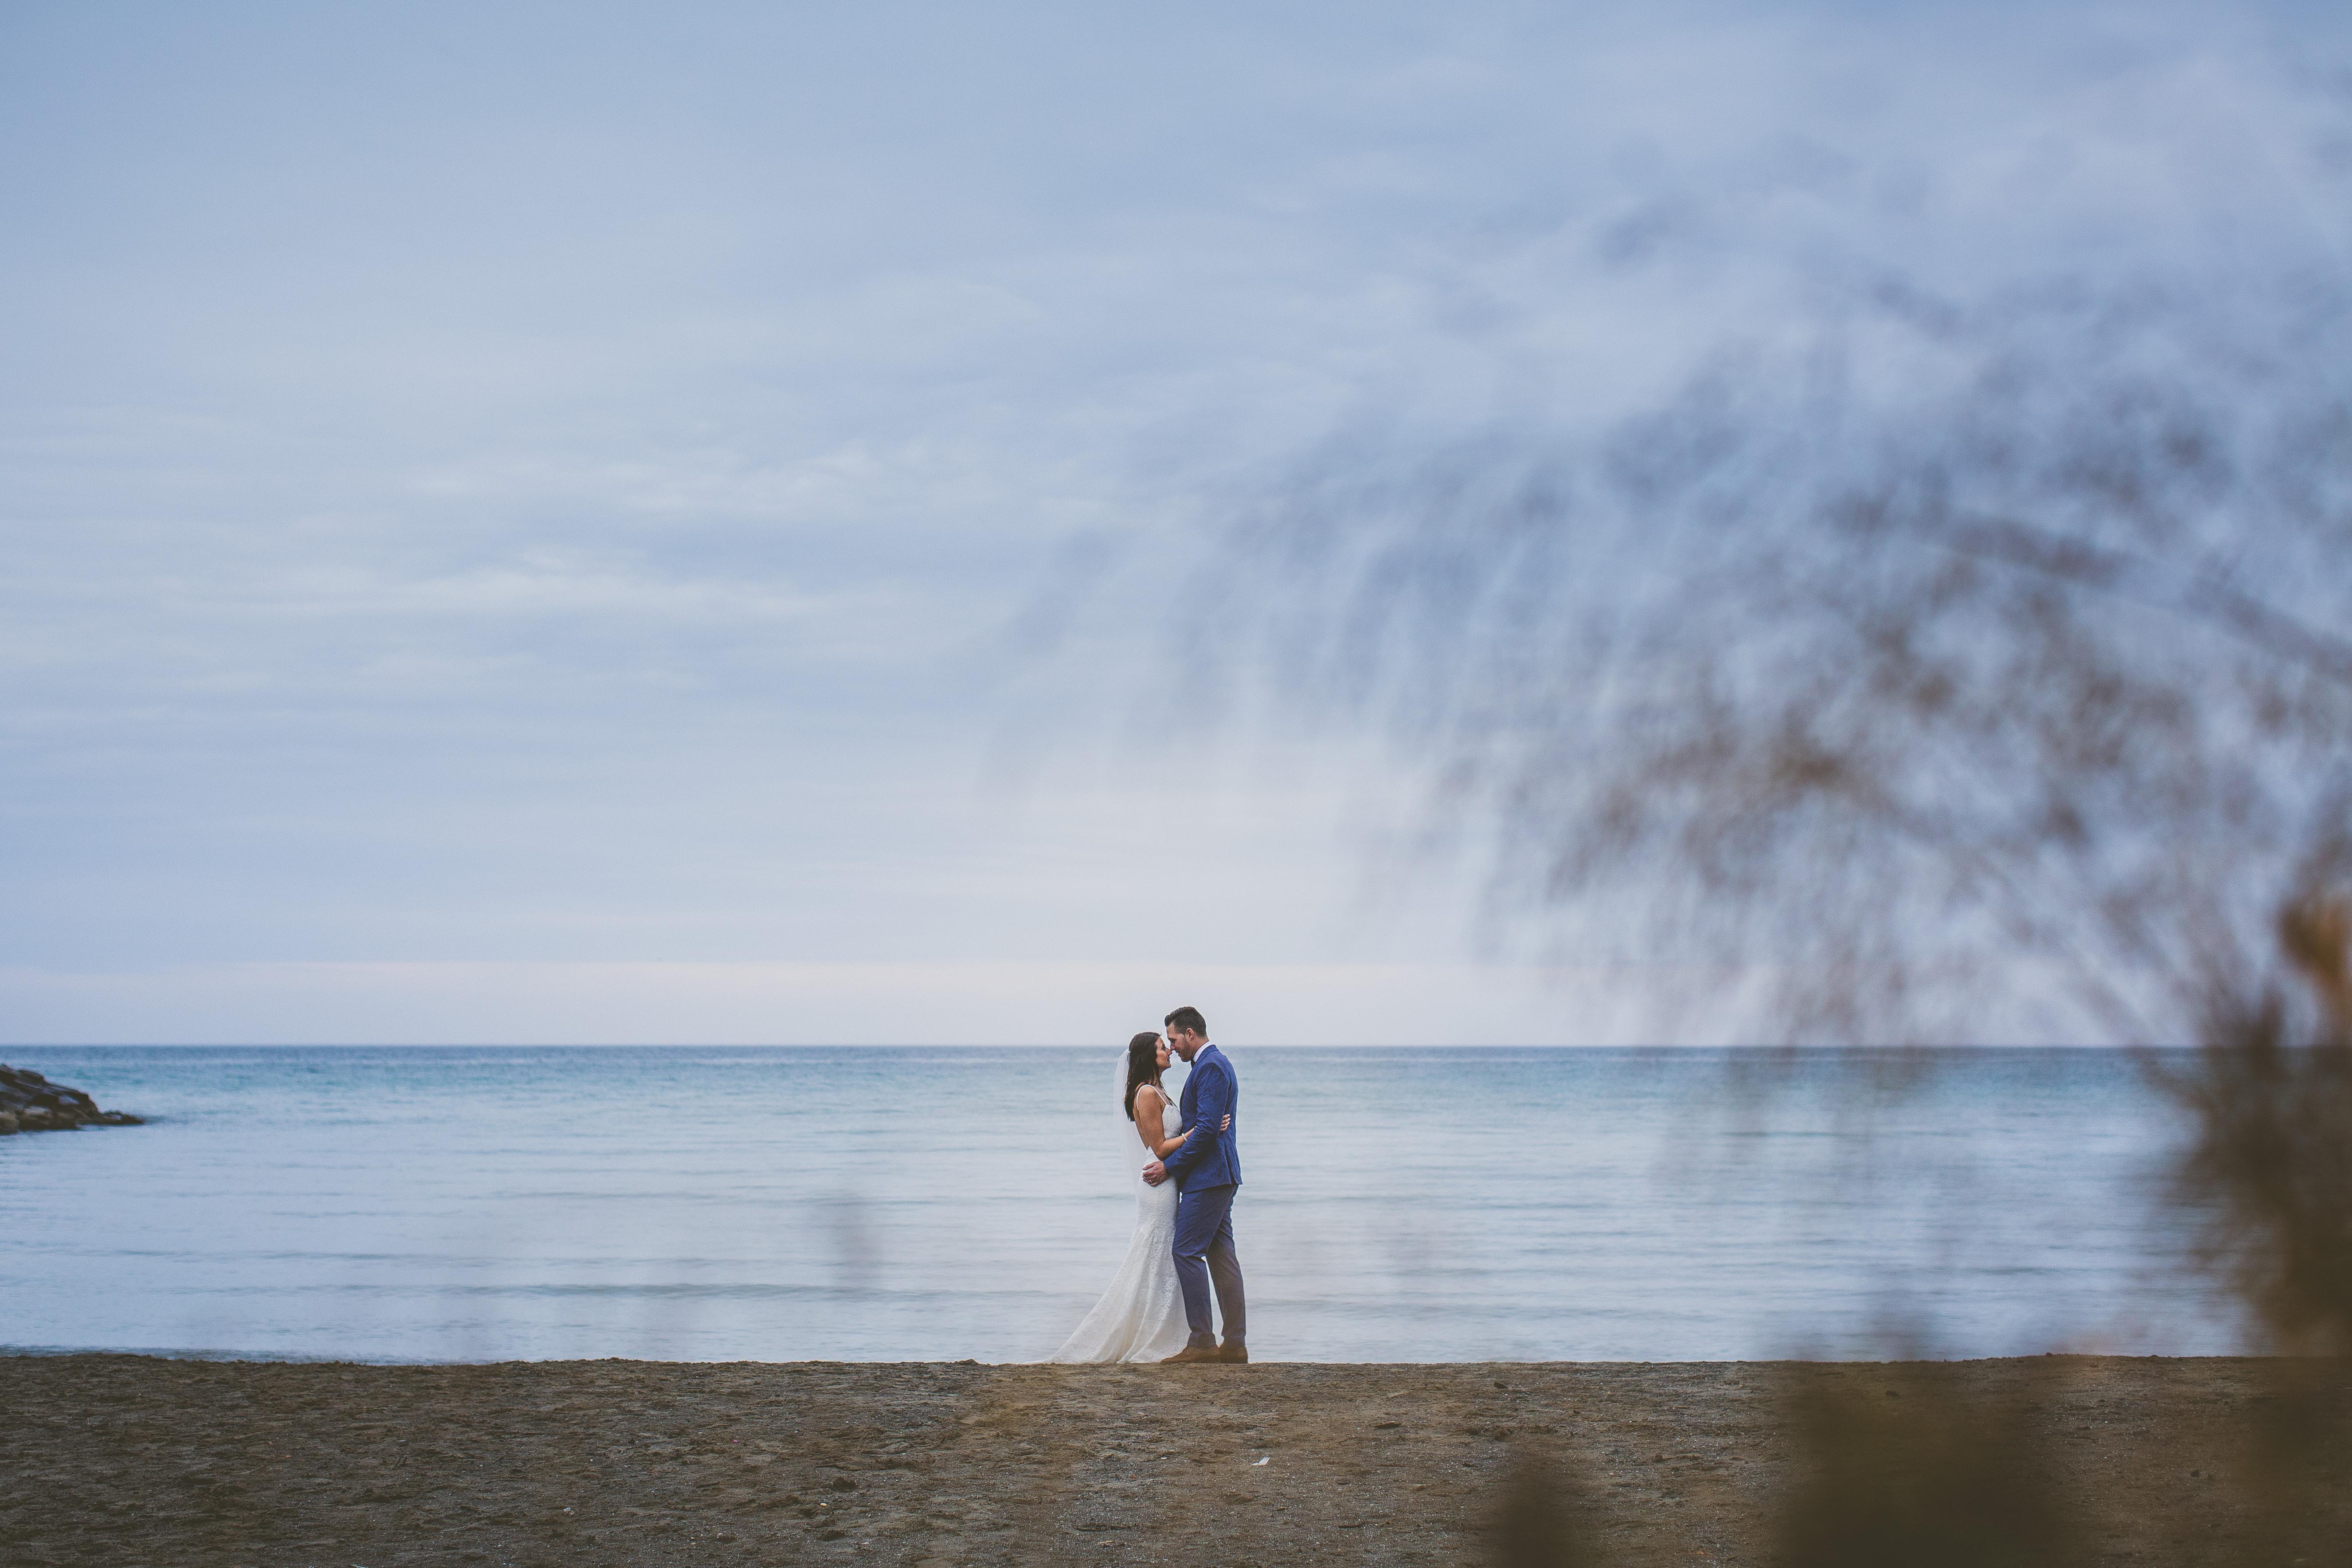 scarborough bluffs wedding photos 74 - Scarborough Bluffs Wedding Photos